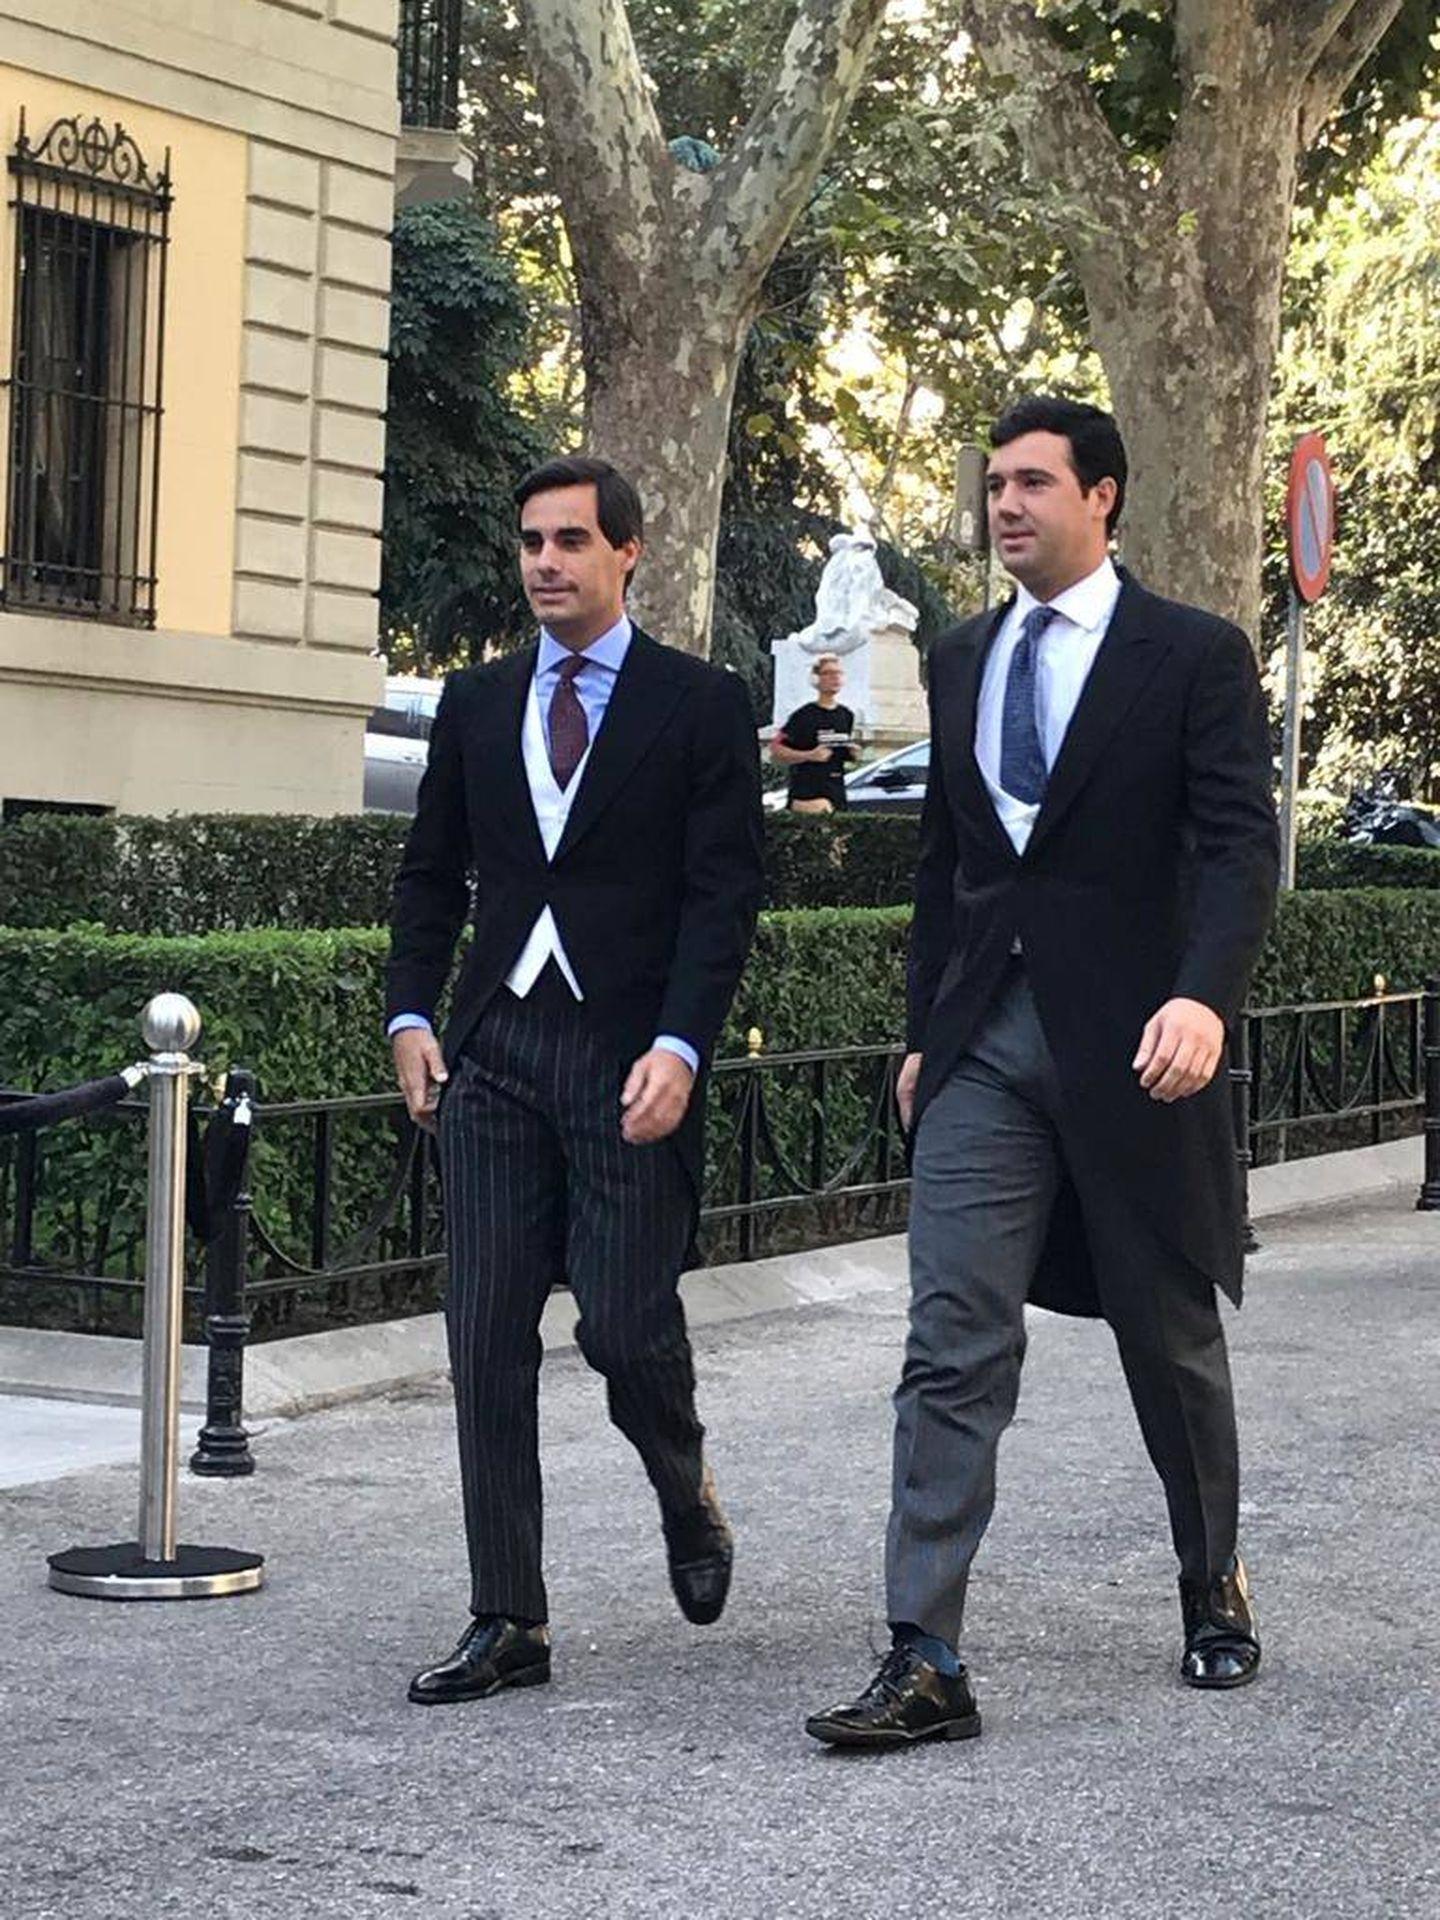 Dos testigos, a su llegada al Palacio de Liria. (P.I.)